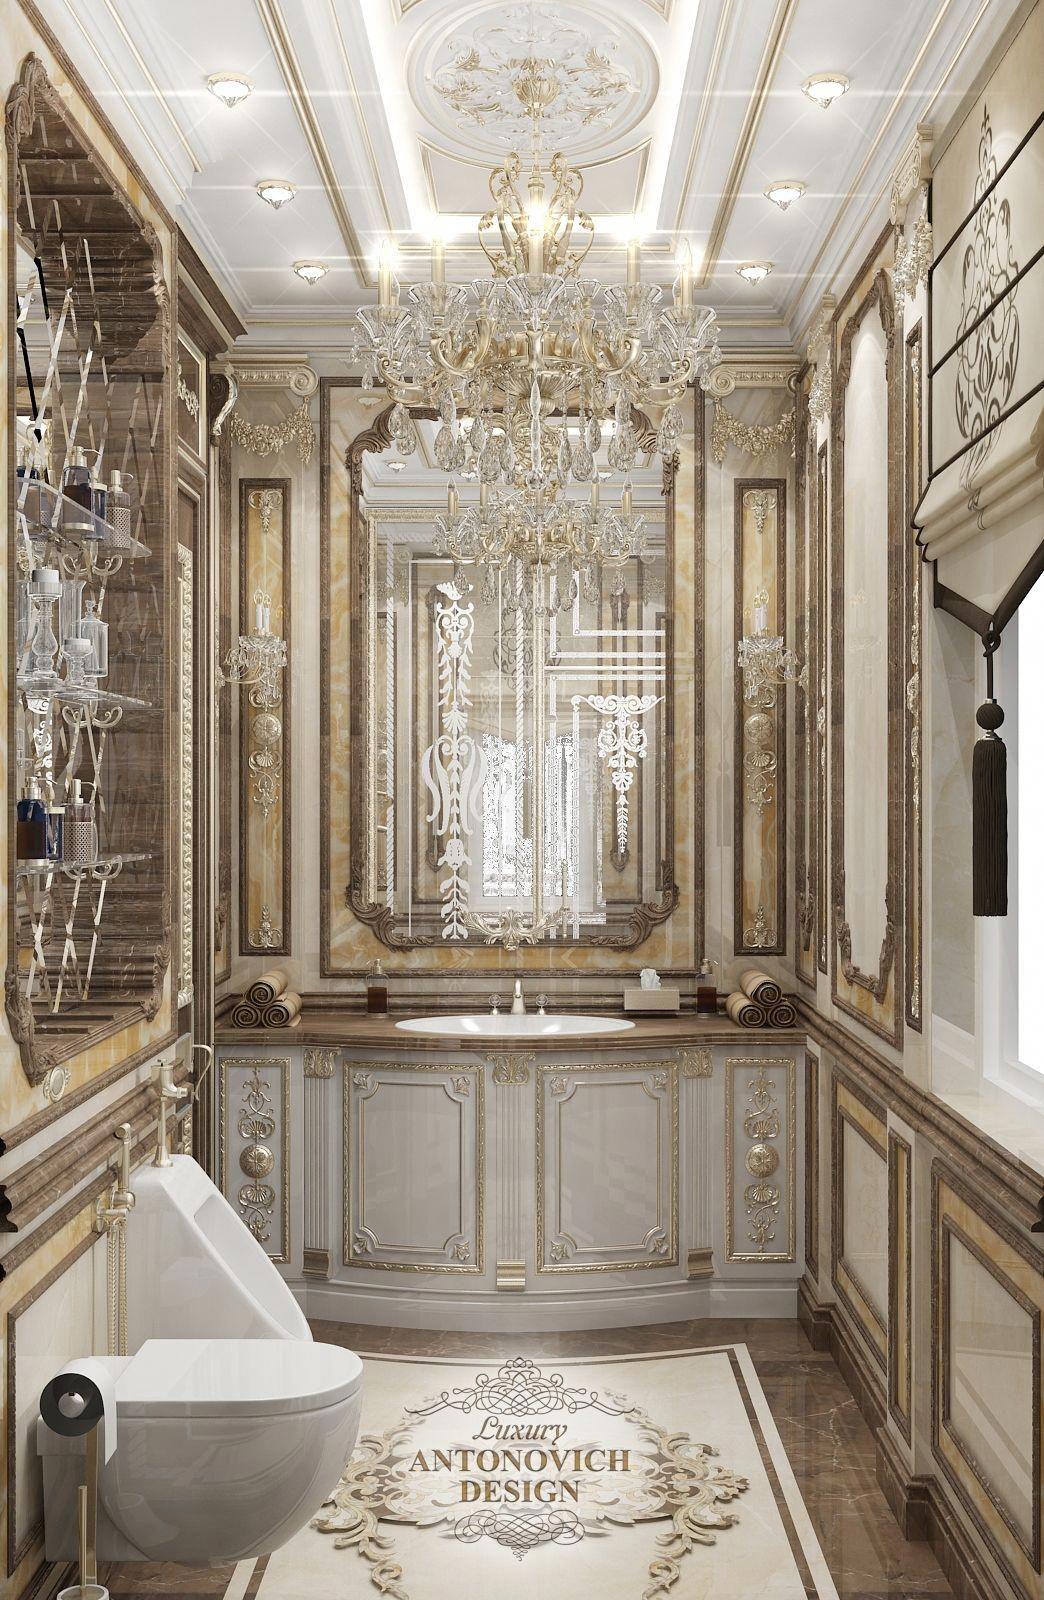 Luxuryhomesinterior Bathroom Design Luxury Luxury Interior Design Bathroom Interior Design